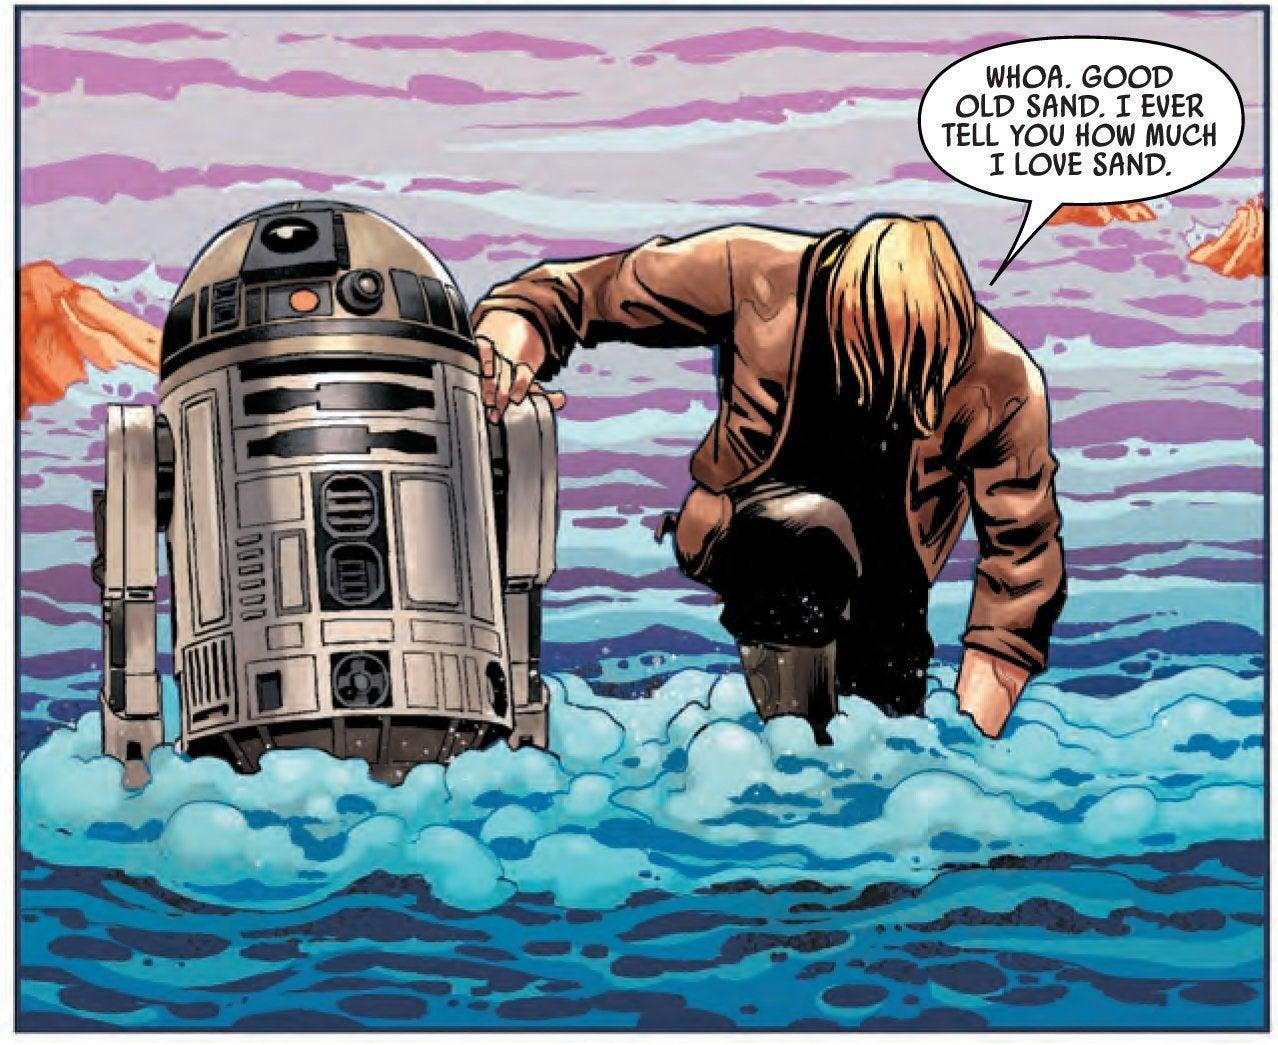 star wars luke skywalkercomic book sand